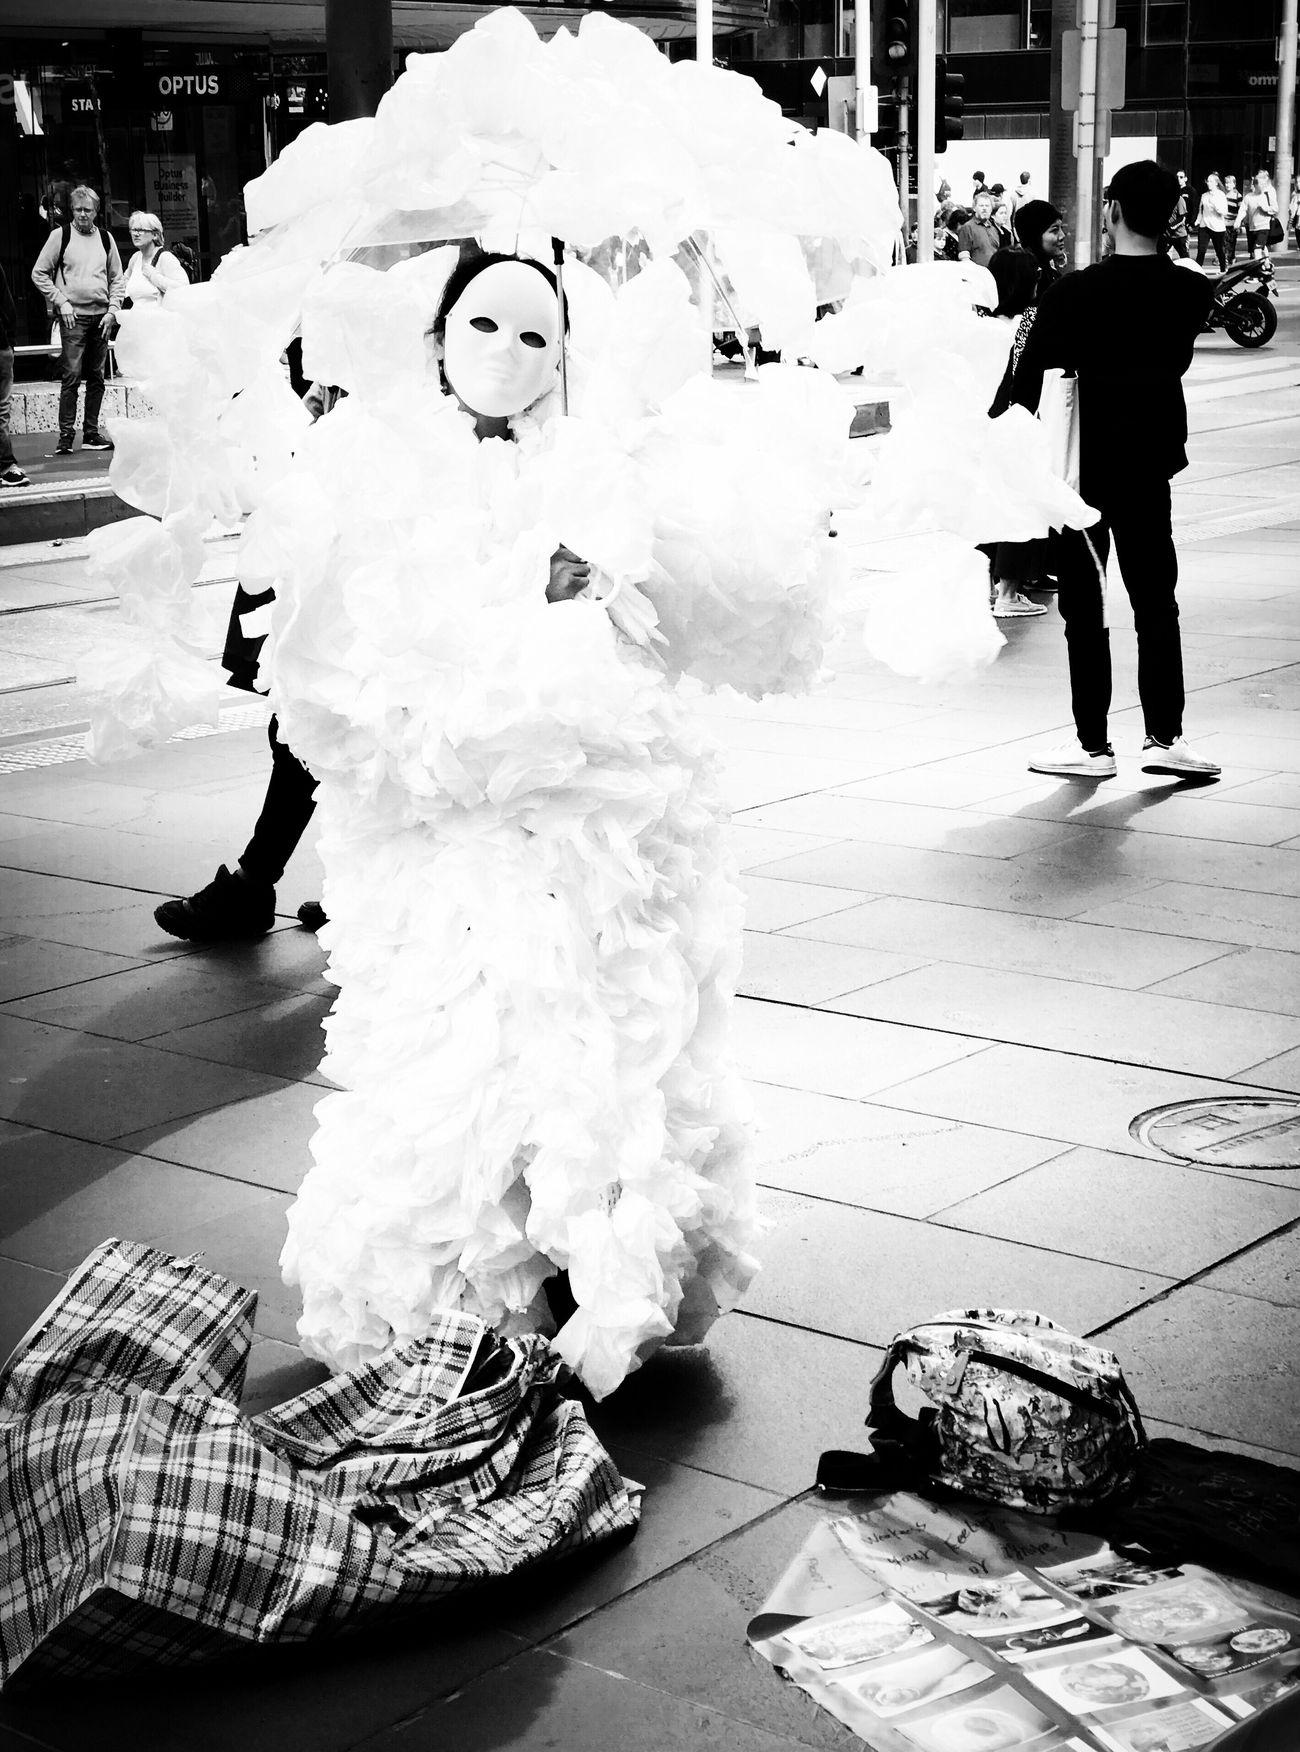 Resist Incidental People Streetphotography Getty Images TheMinimals (less Edit Juxt Photography) Shootermag Shootermag_australia Mermaid Street EyeEm Diversity